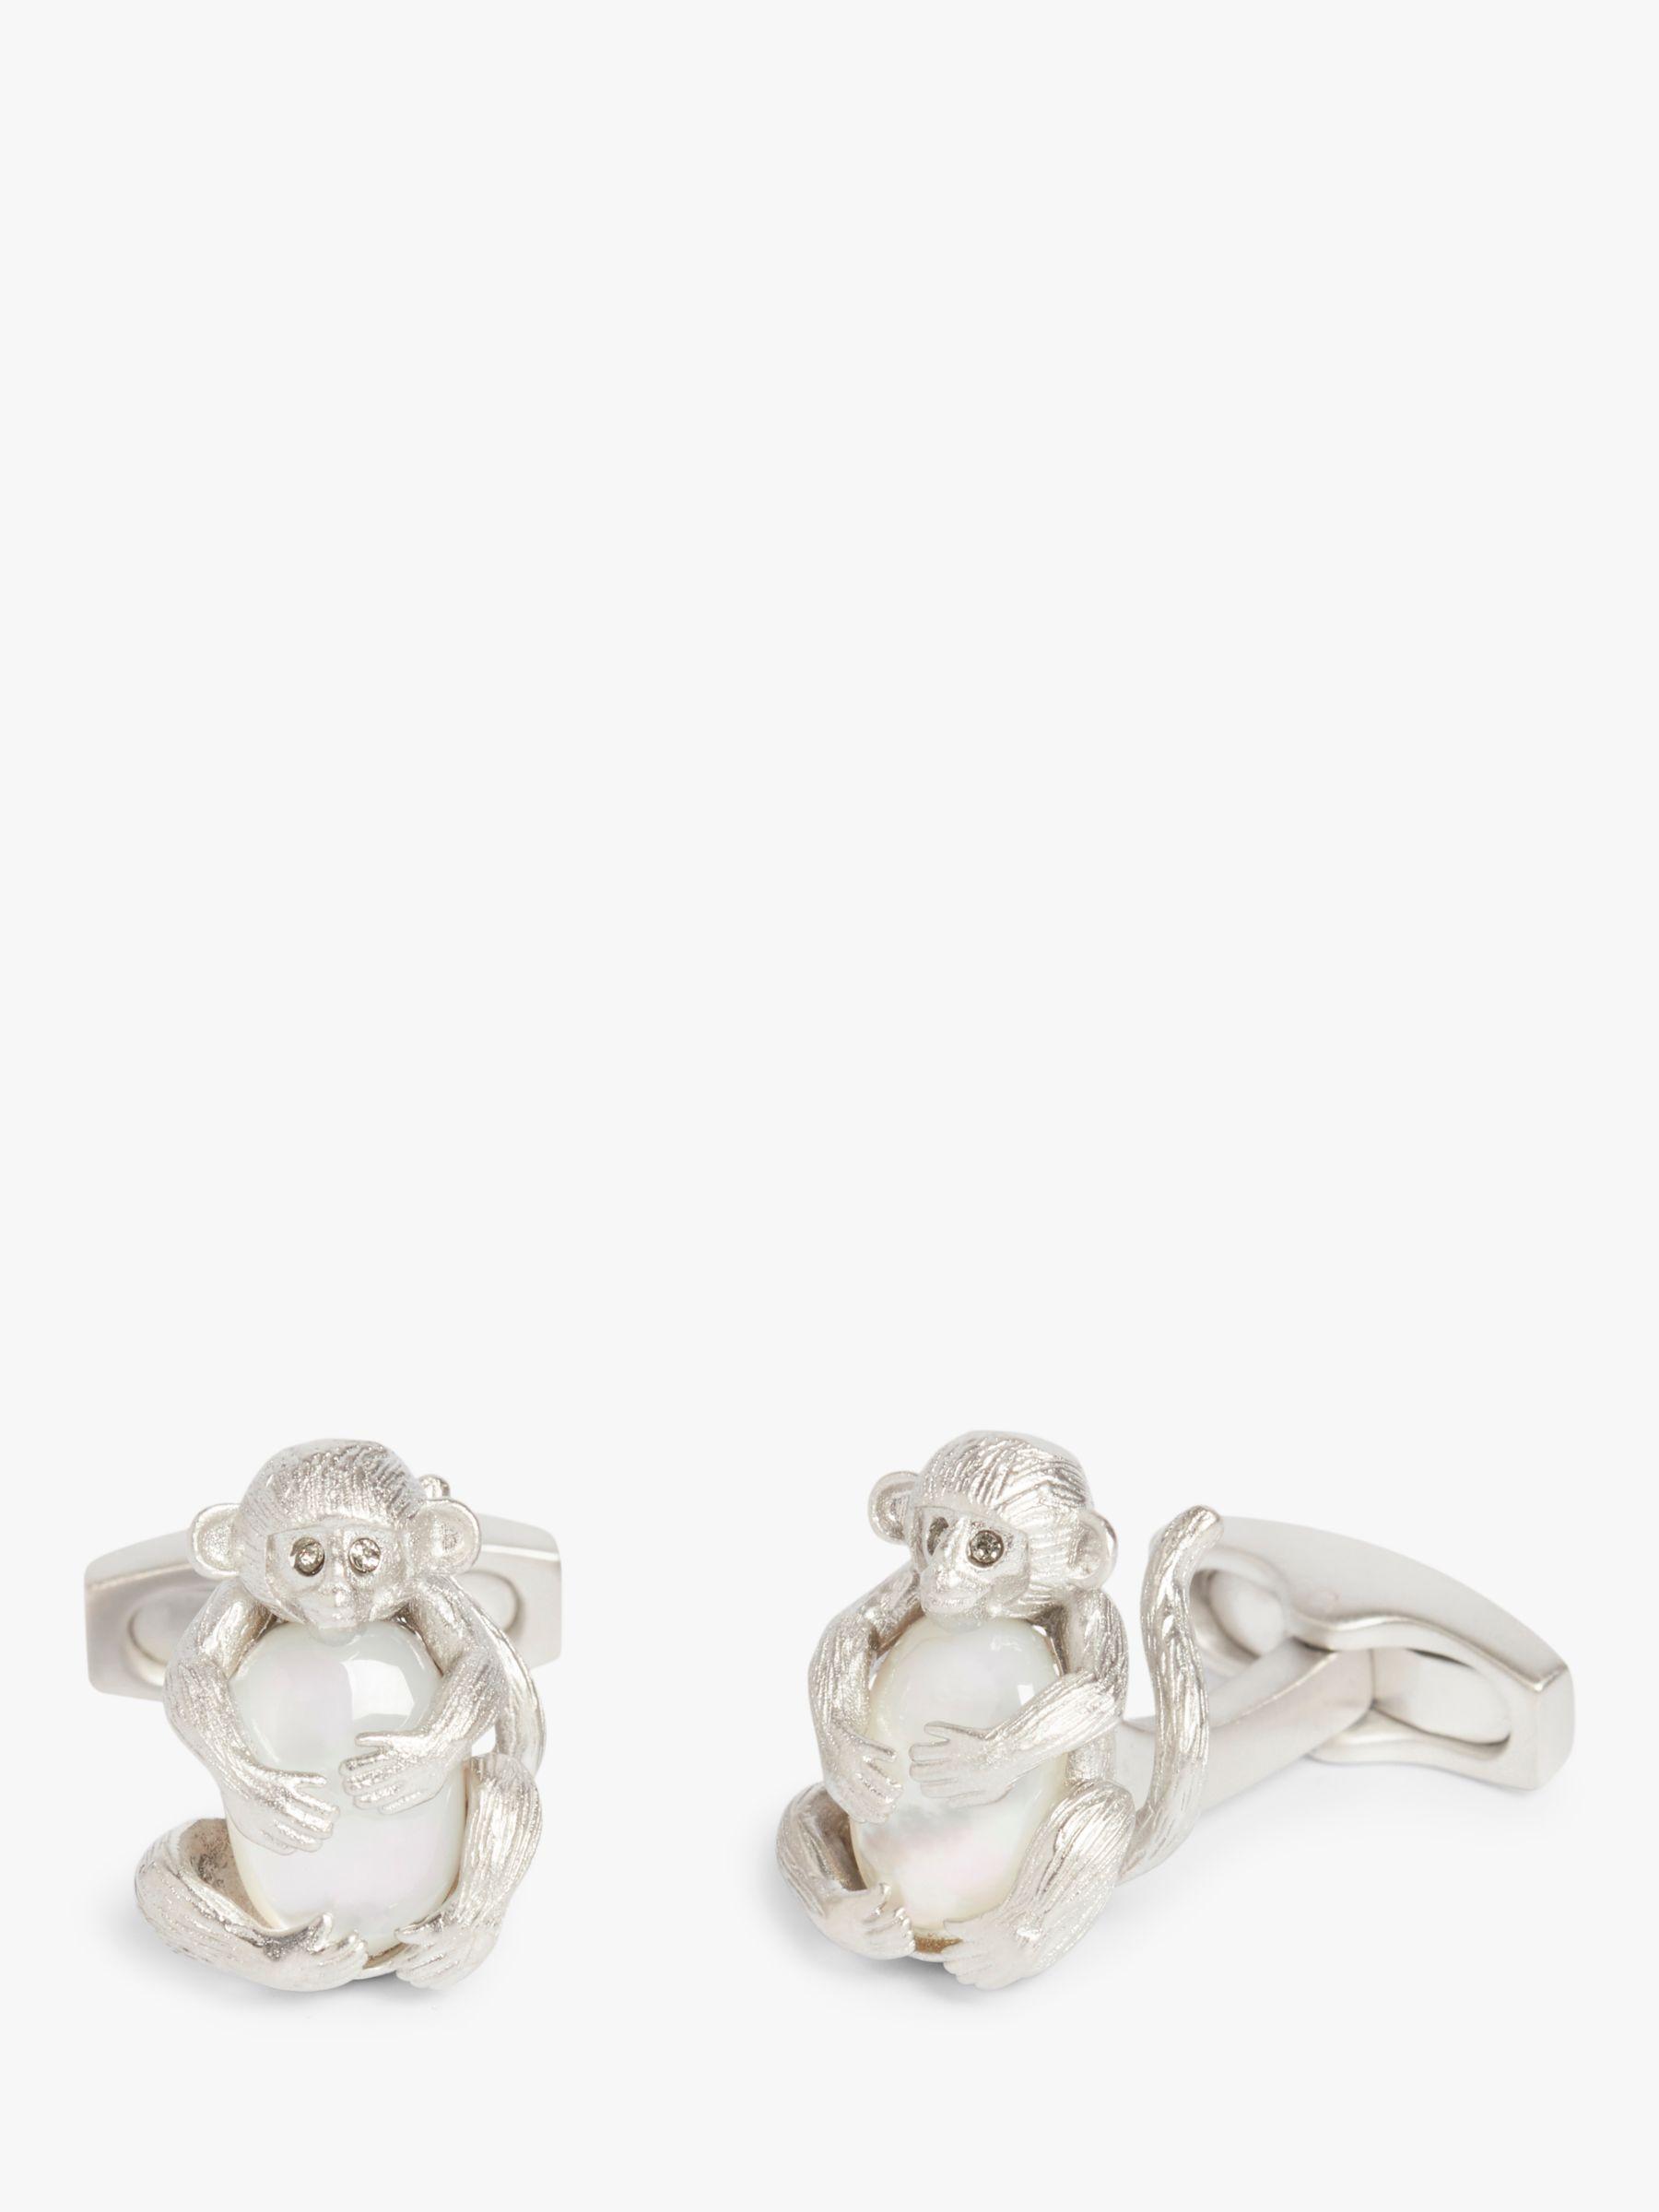 Simon Carter Simon Carter Monkey Mother of Pearl Egg Cufflinks, Silver